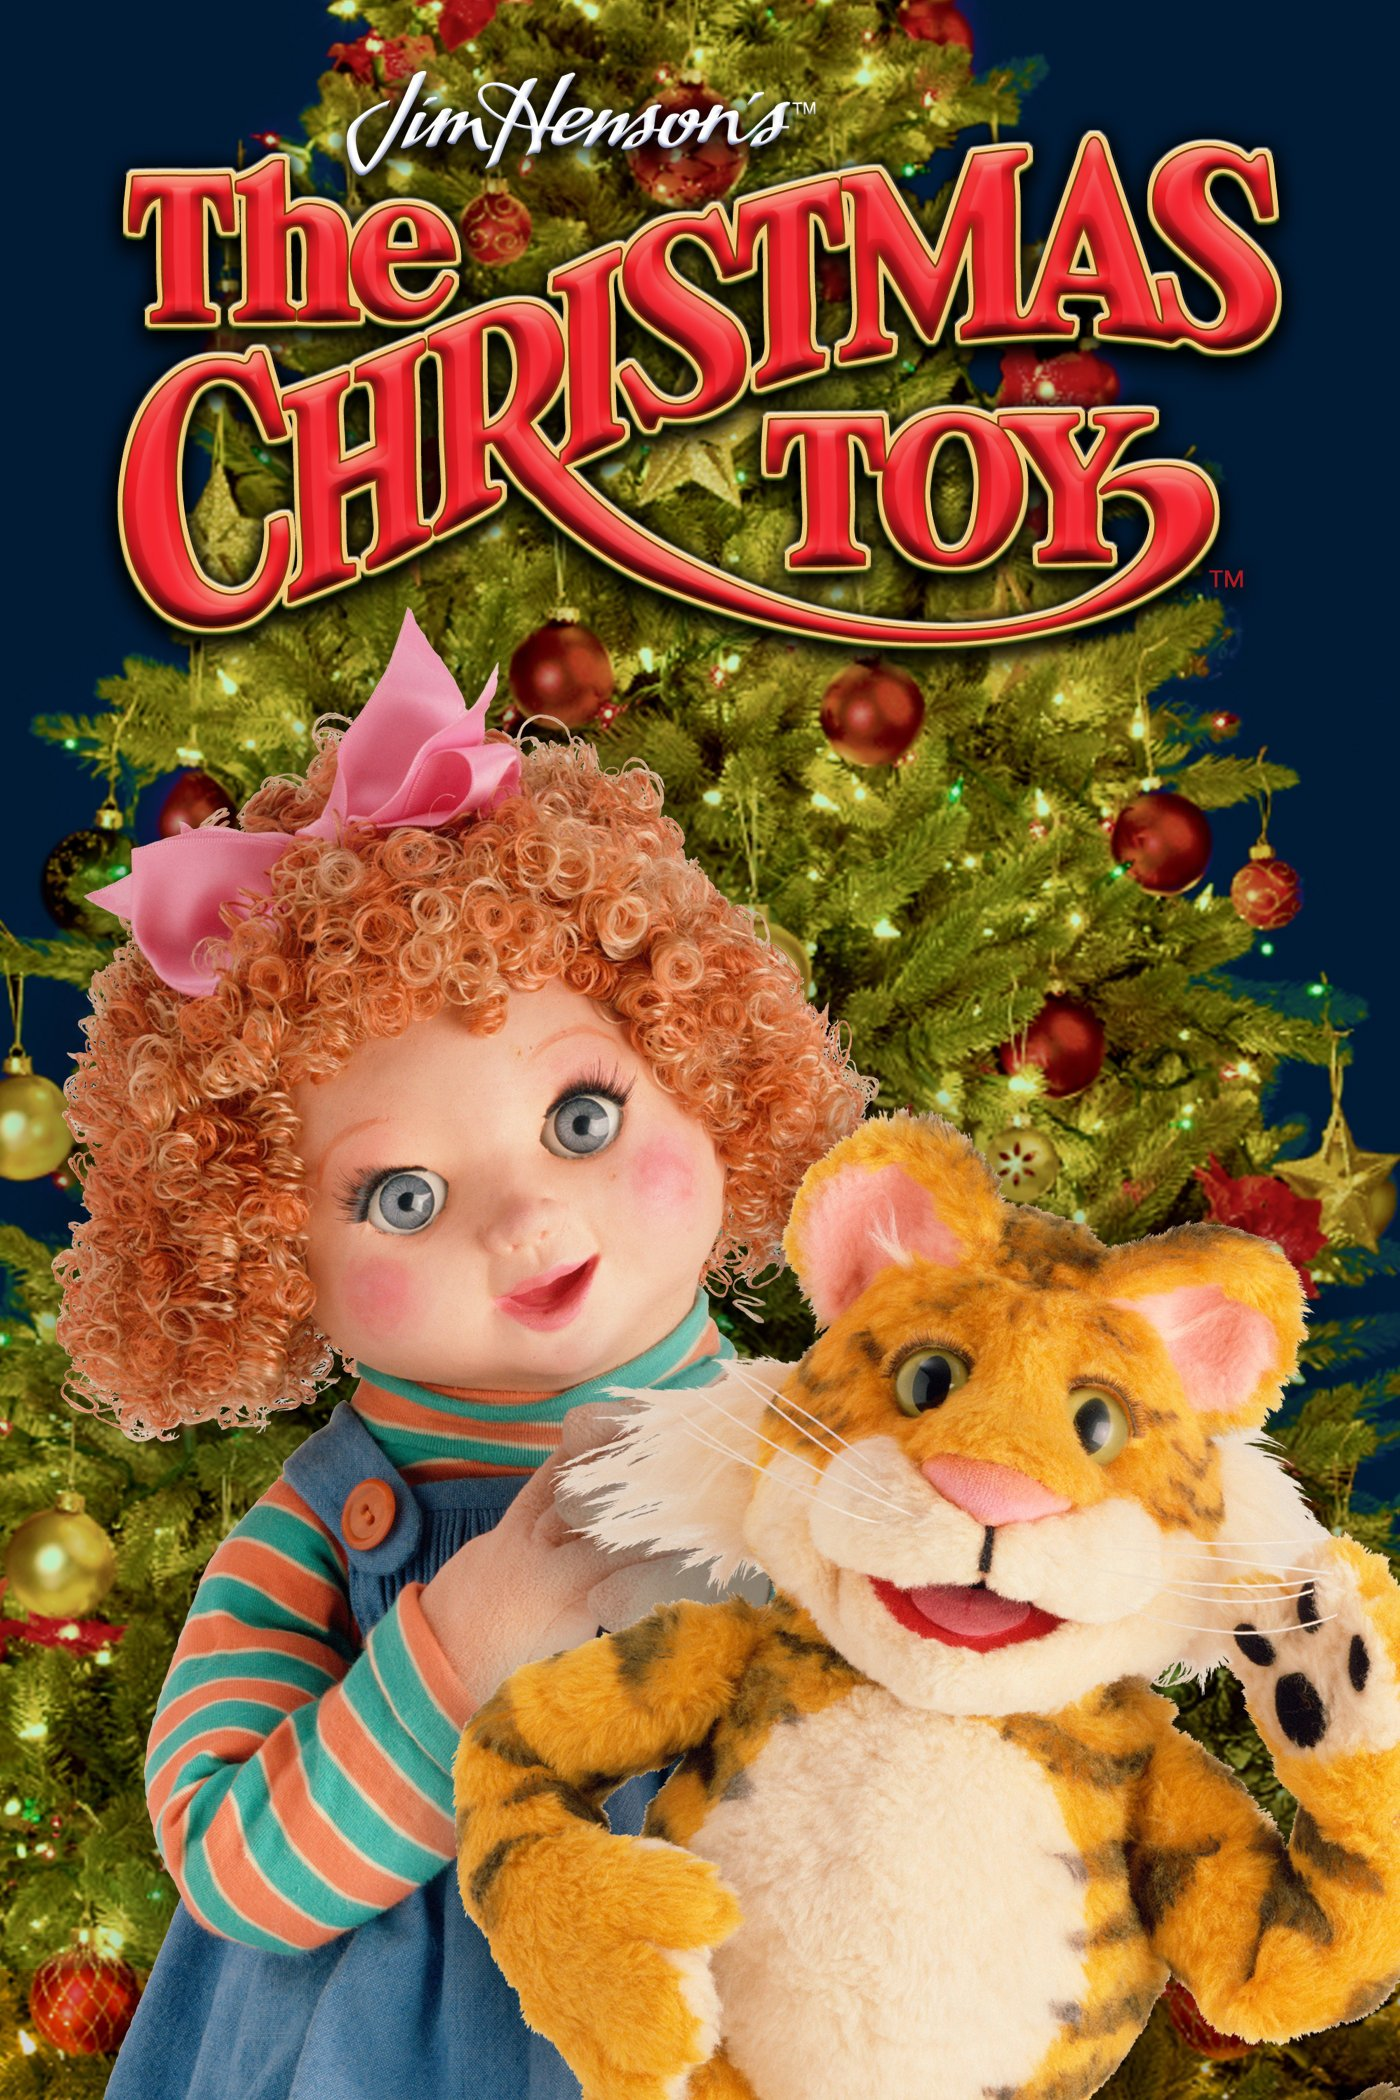 Amazon.com: The Christmas Toy: Dave Goelz, Steve Whitmire, Kathryn ...